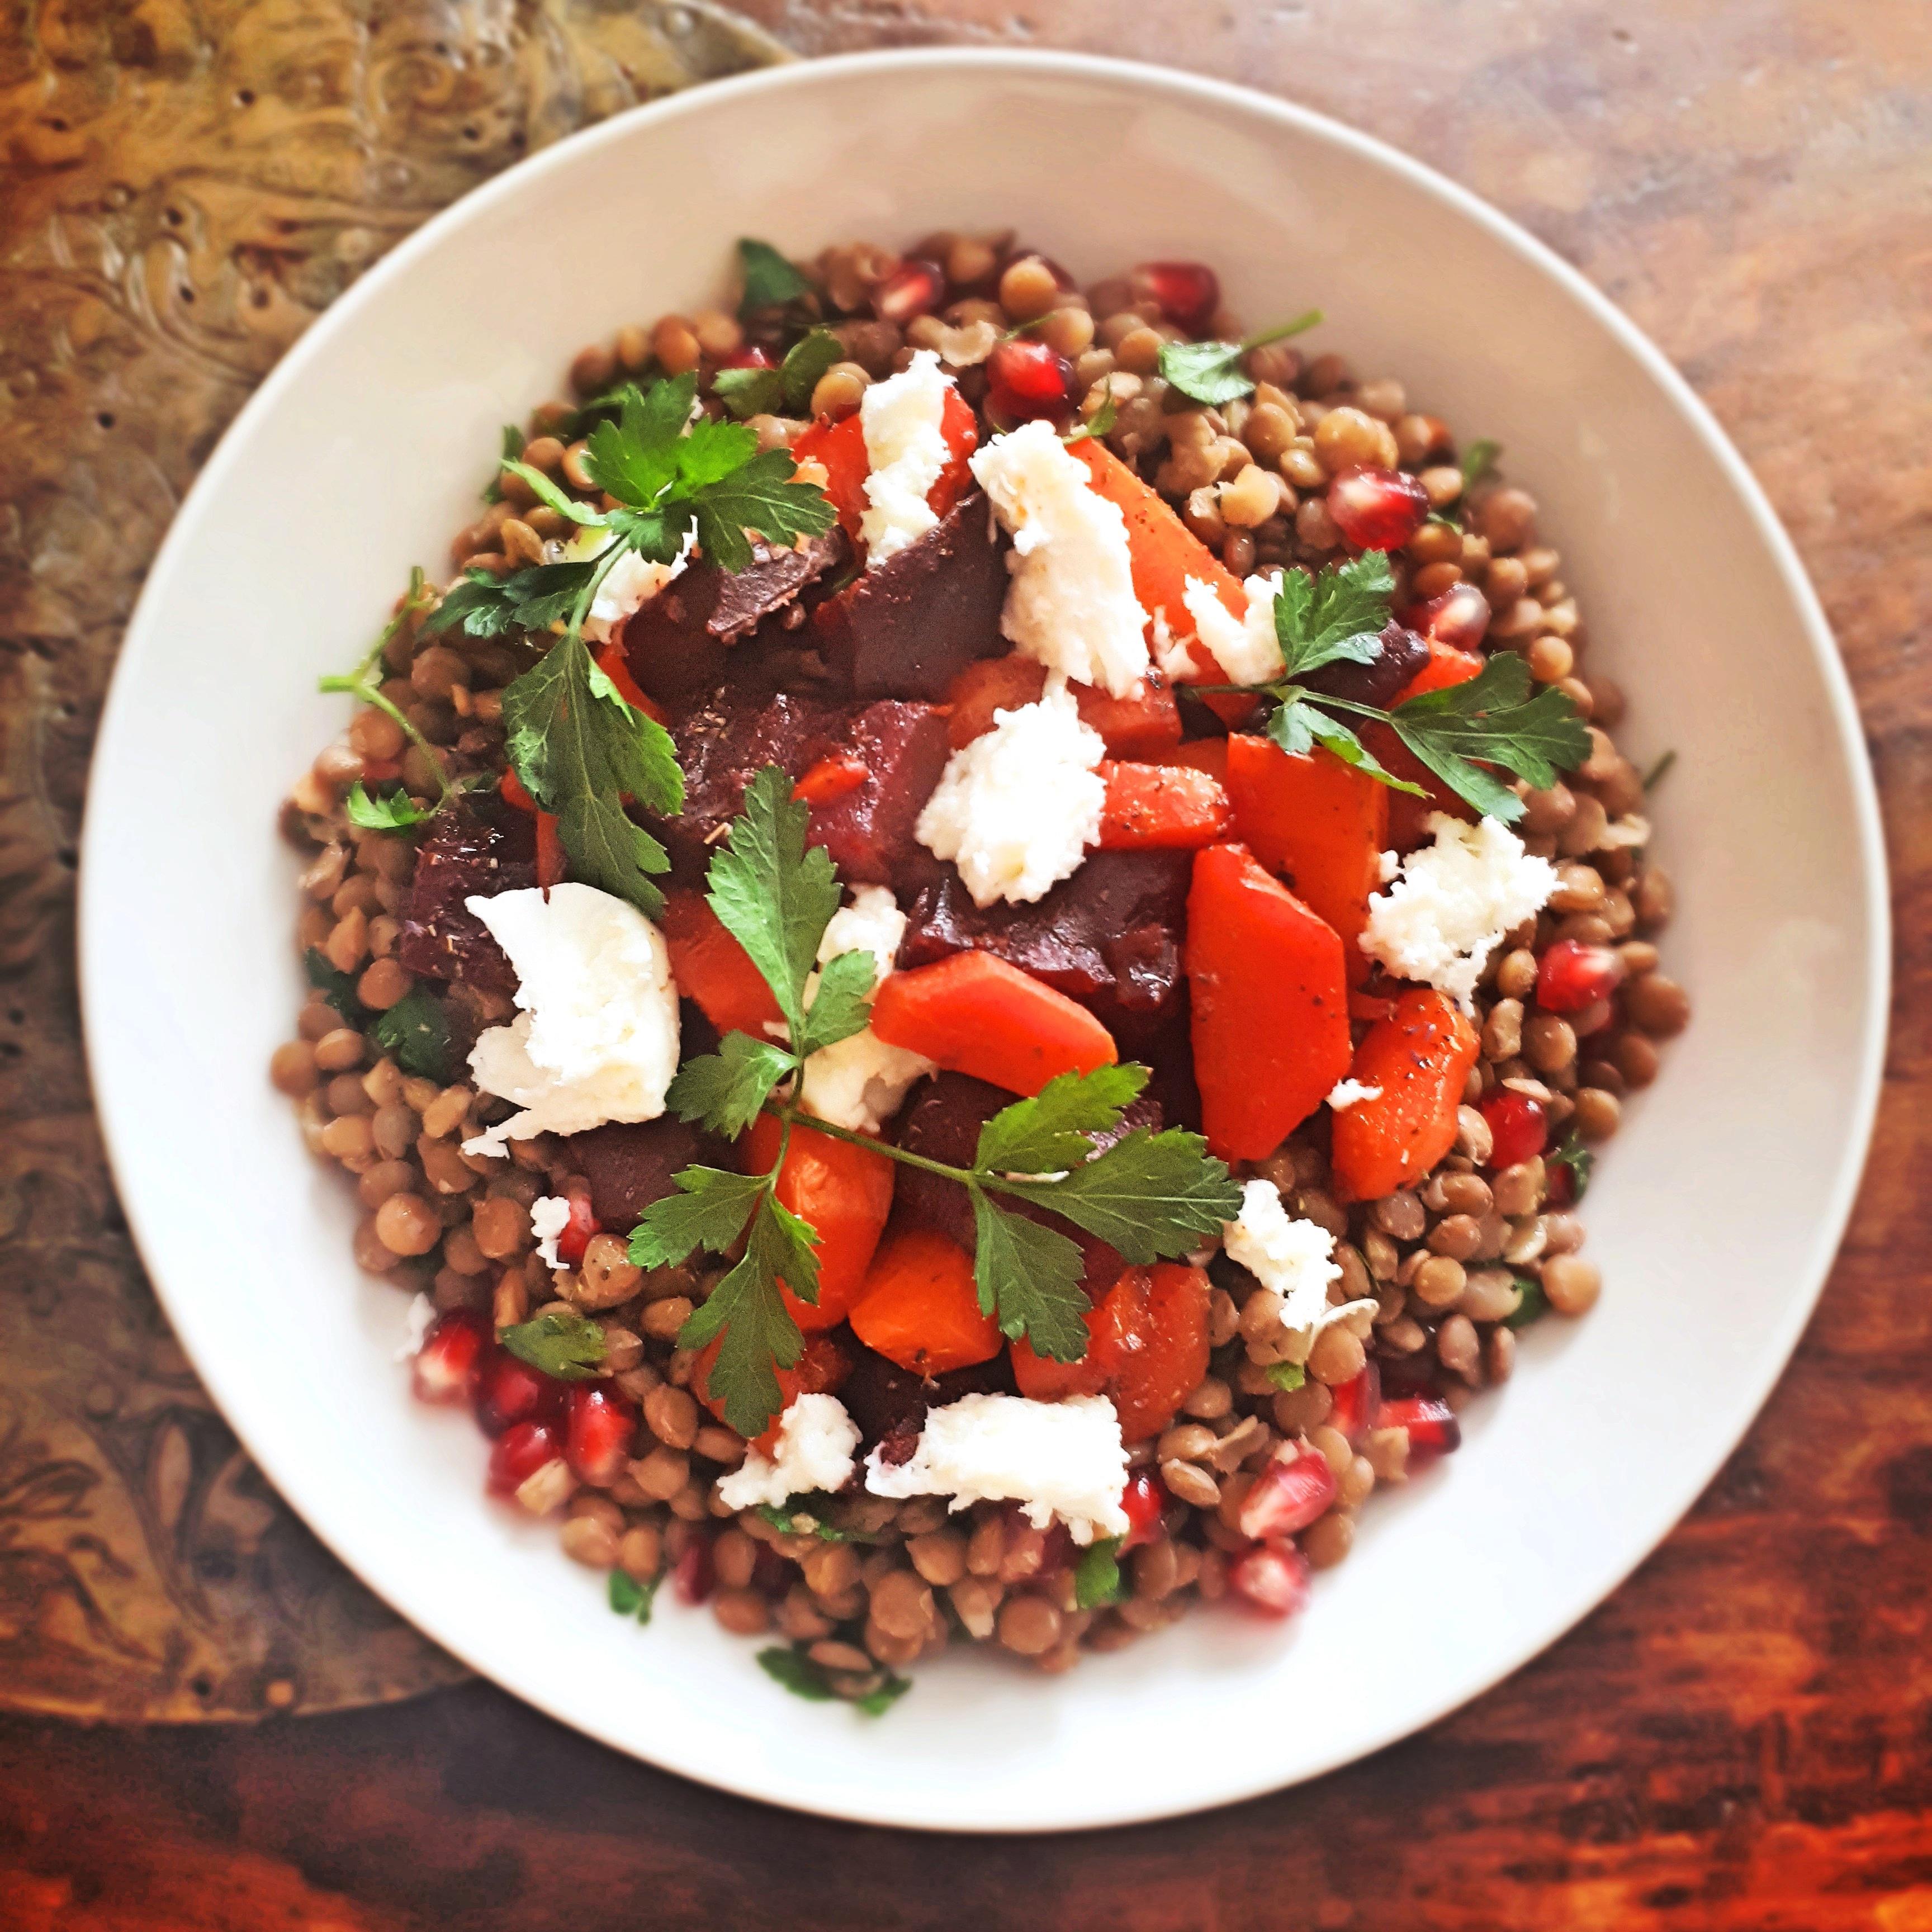 Berglinsen-Rote-Bete-Salat-Rezept-RUN2YOGA